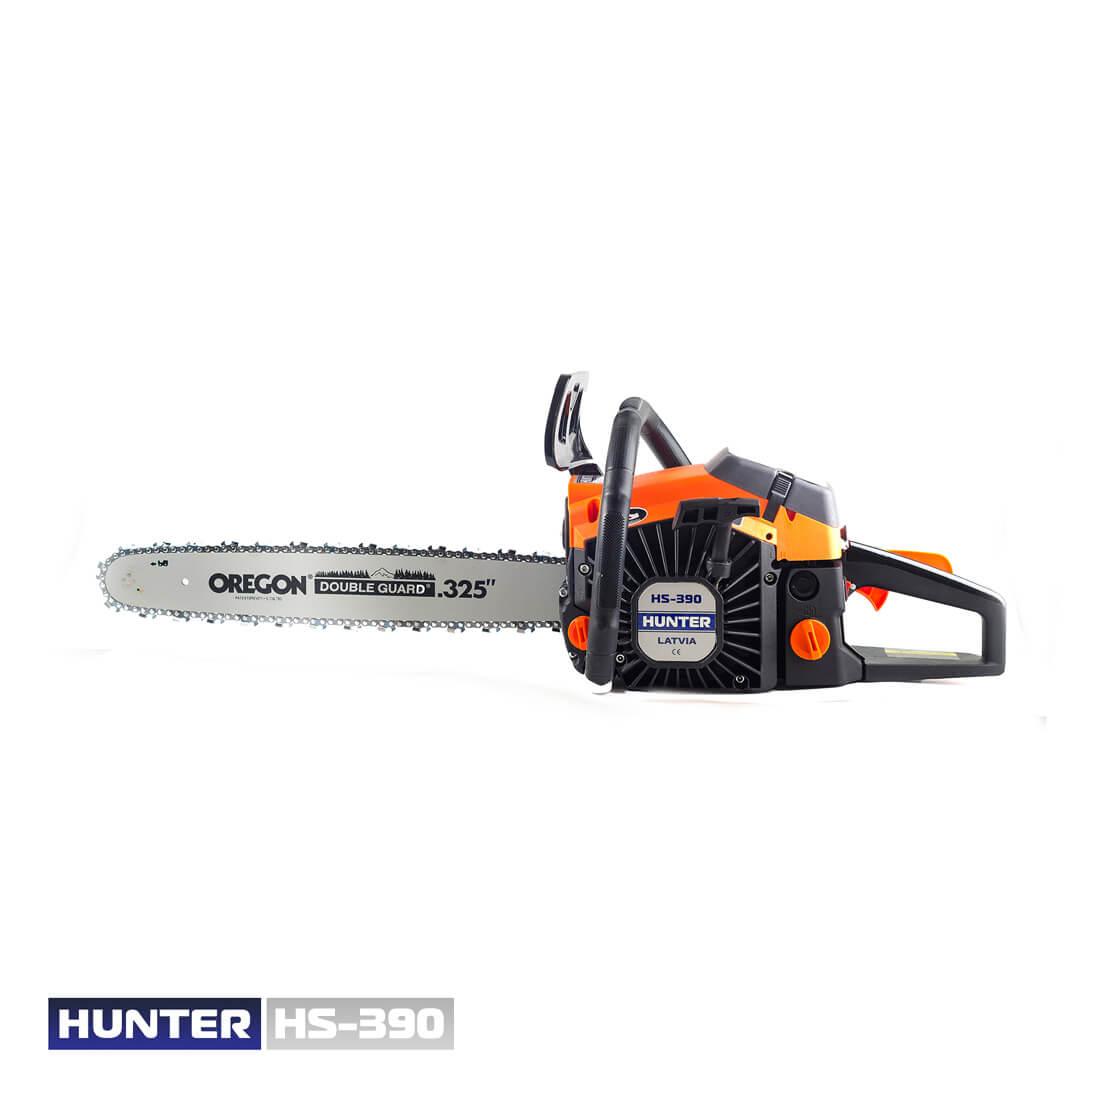 Фото Hunter HS-390 цена 3970грн №2 — Hunter